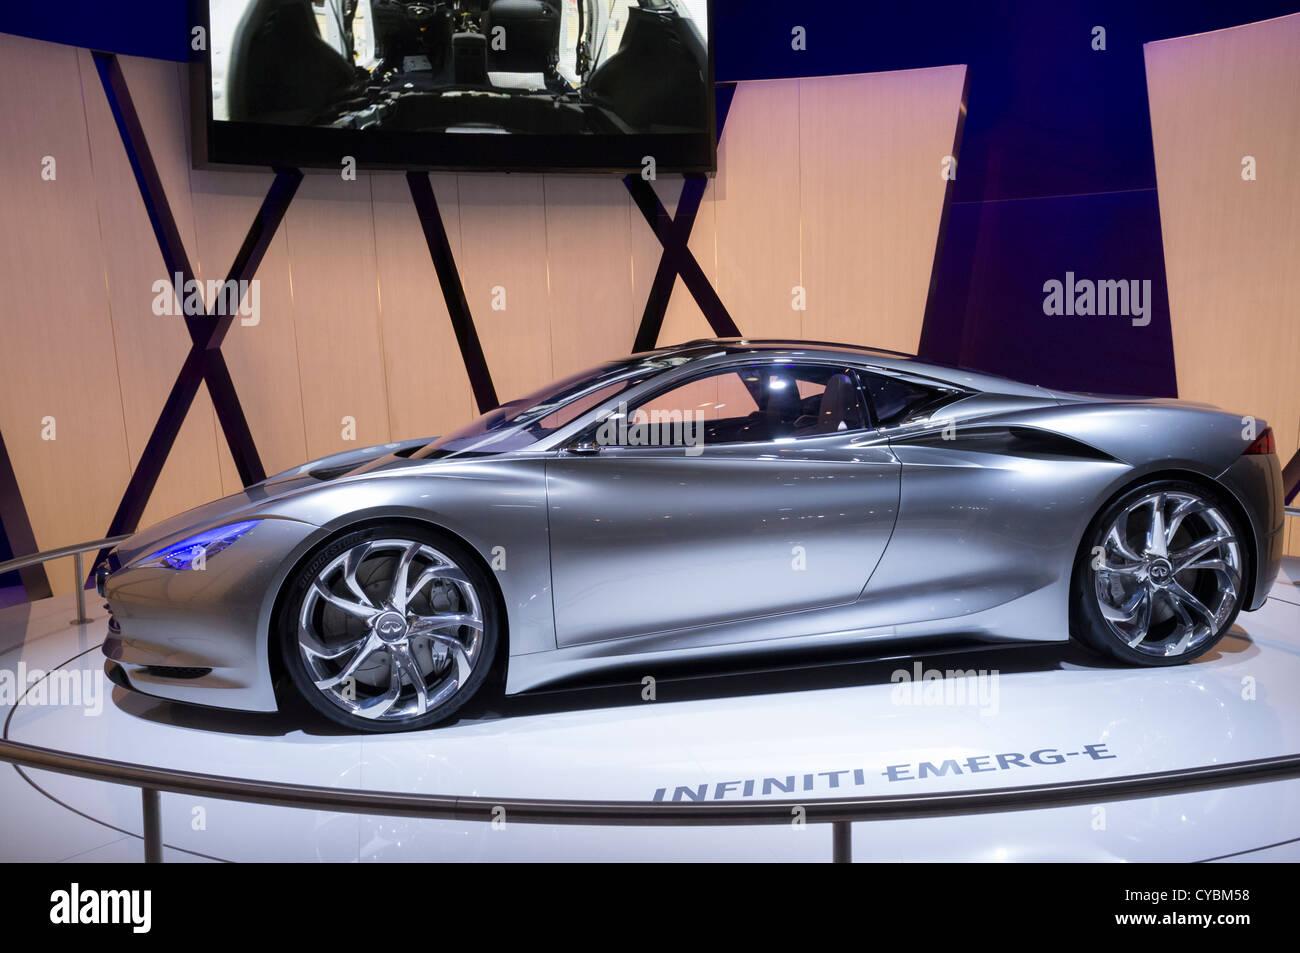 Infiniti electric concept Emerge-E car at Paris Motor Show 2012 - Stock Image